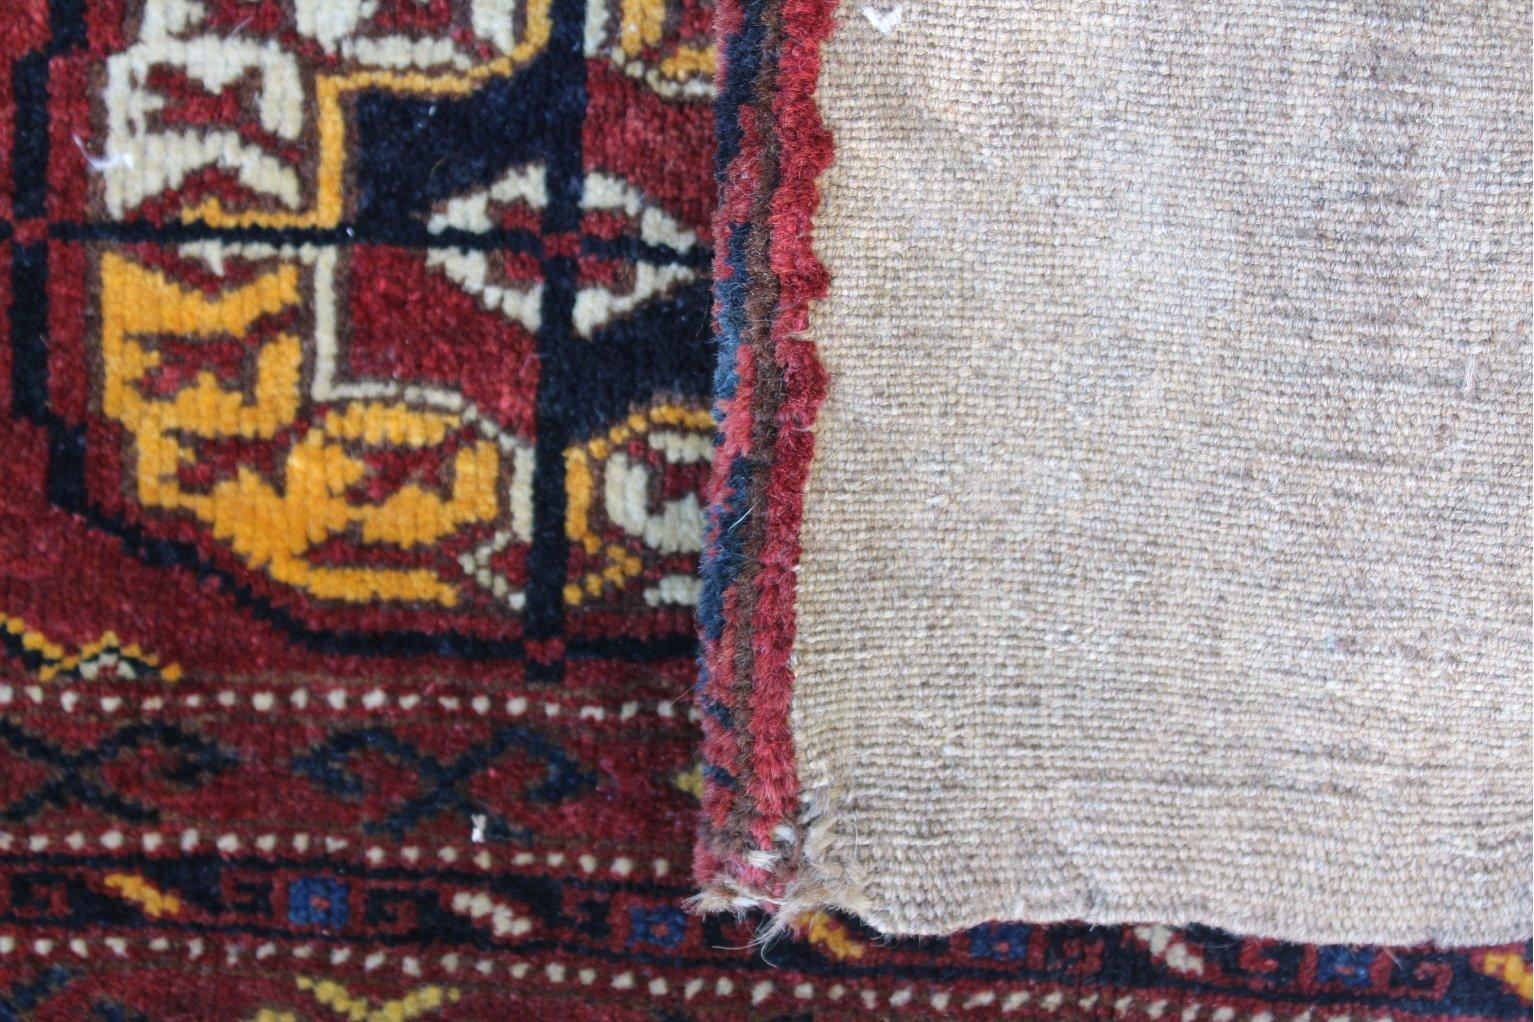 Belutsch-Tasche, antik um 1900-1